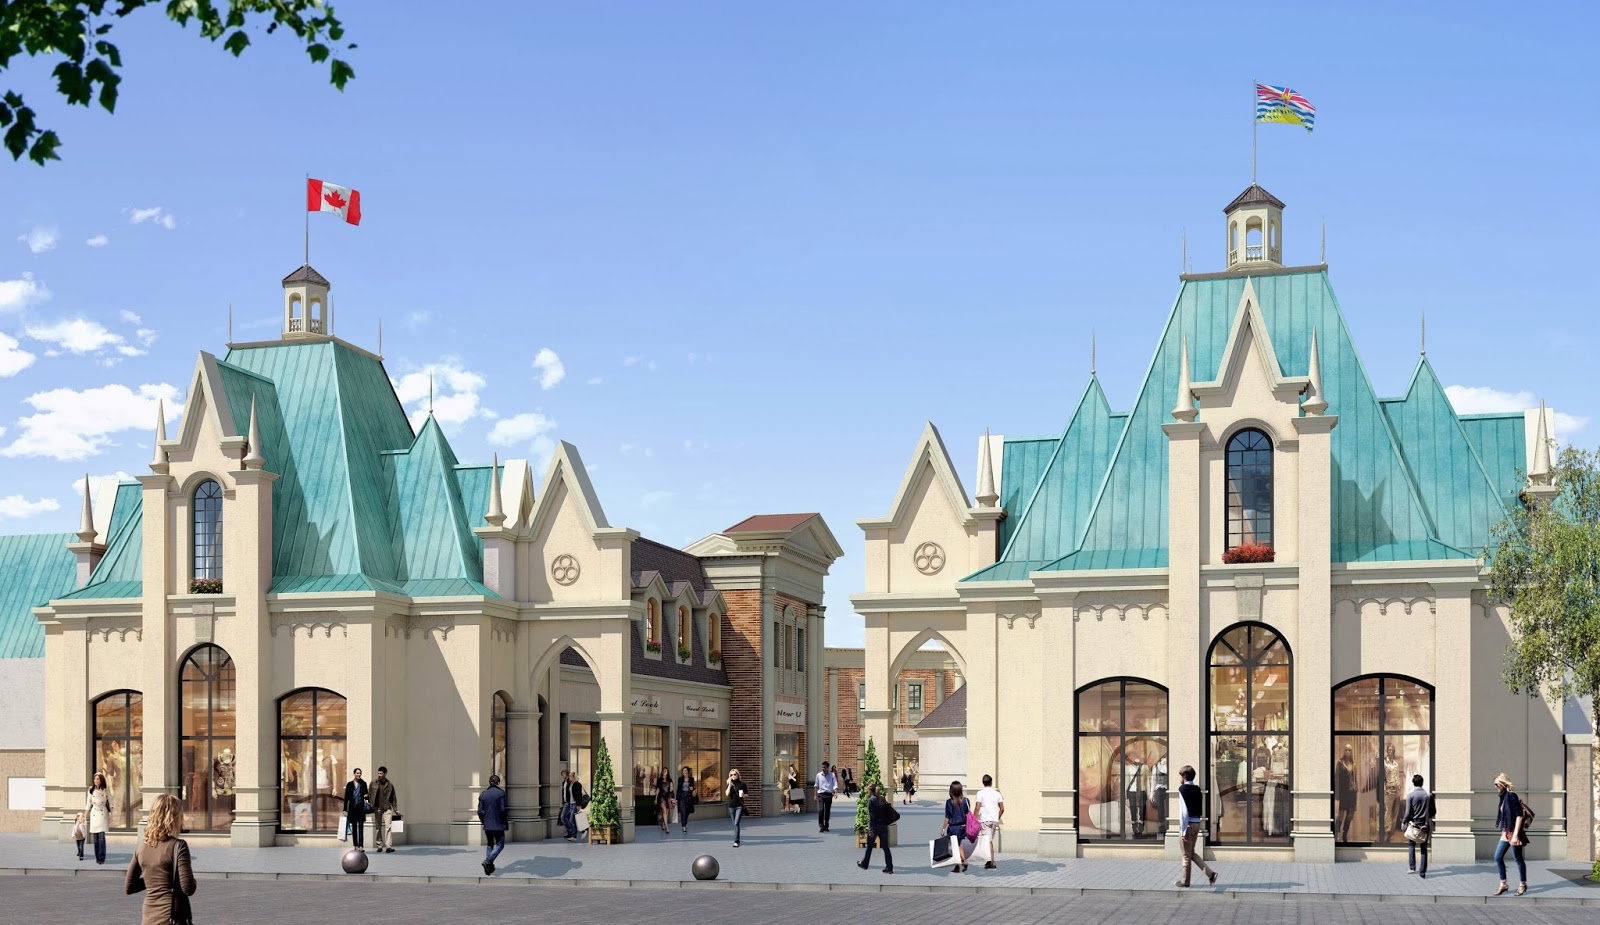 Luxury+Outlet+Centre+Main+Entrance+retail+insider.jpg